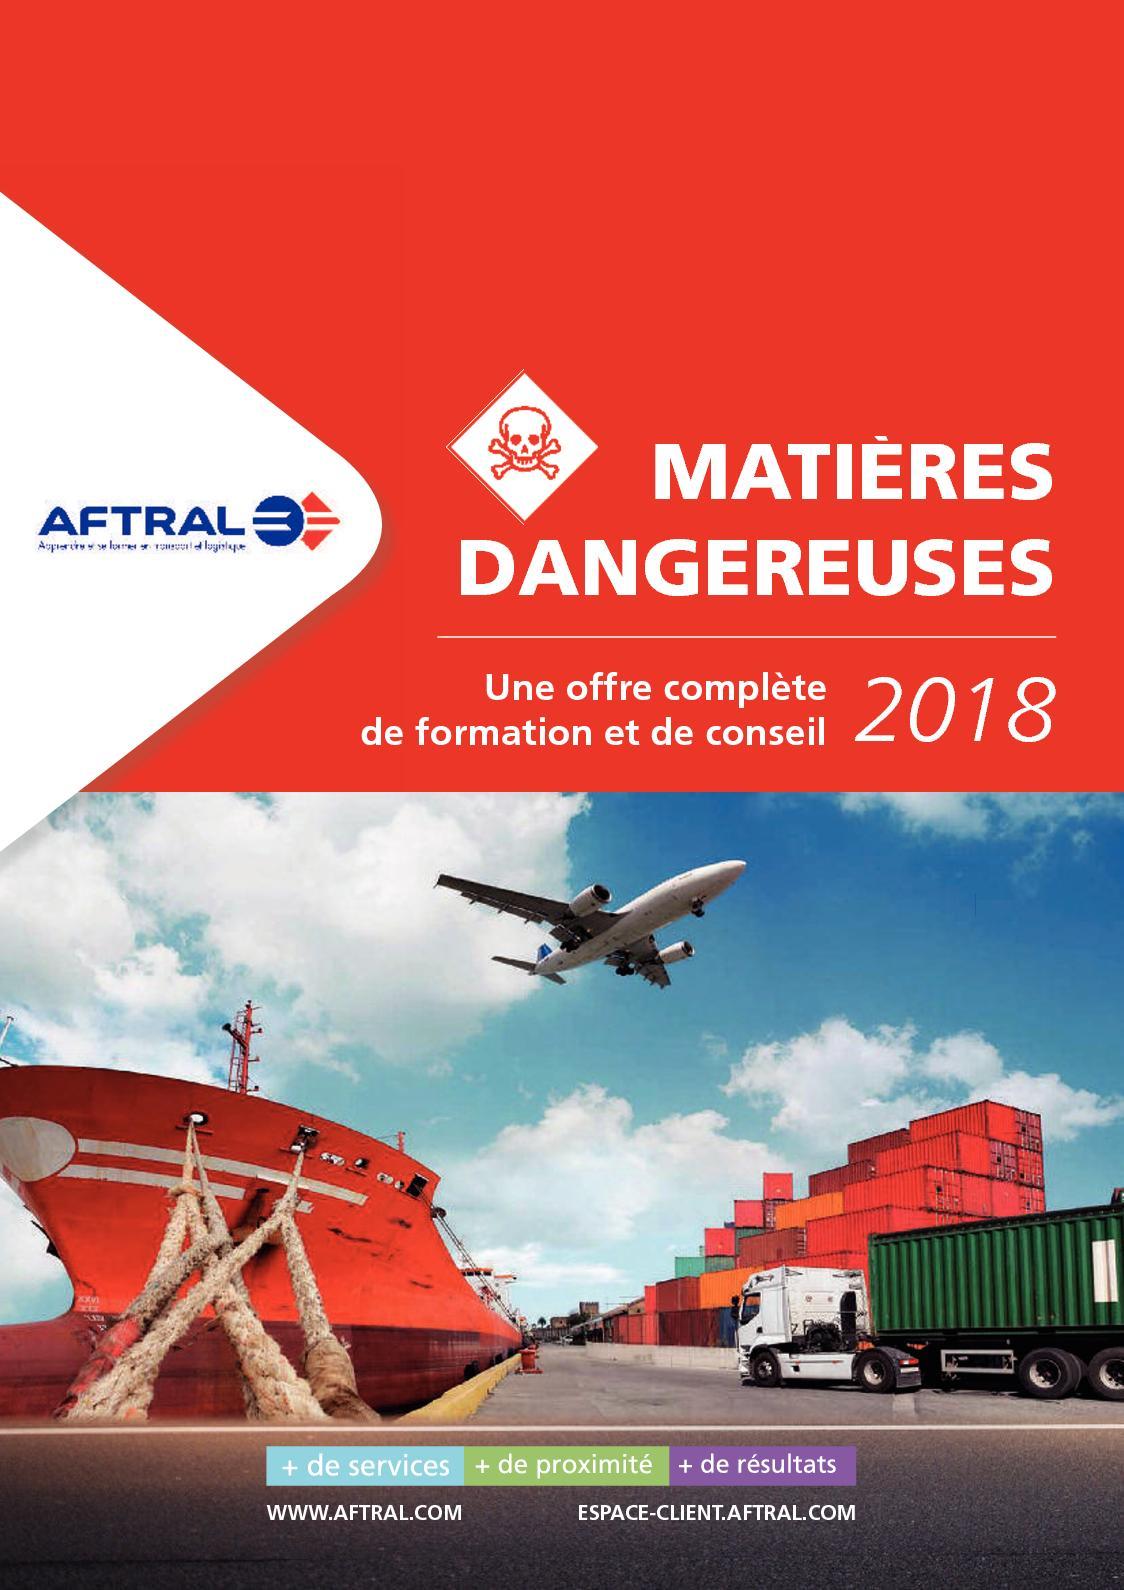 Offre De Formation Aftral Matieres Dangereuses 2018